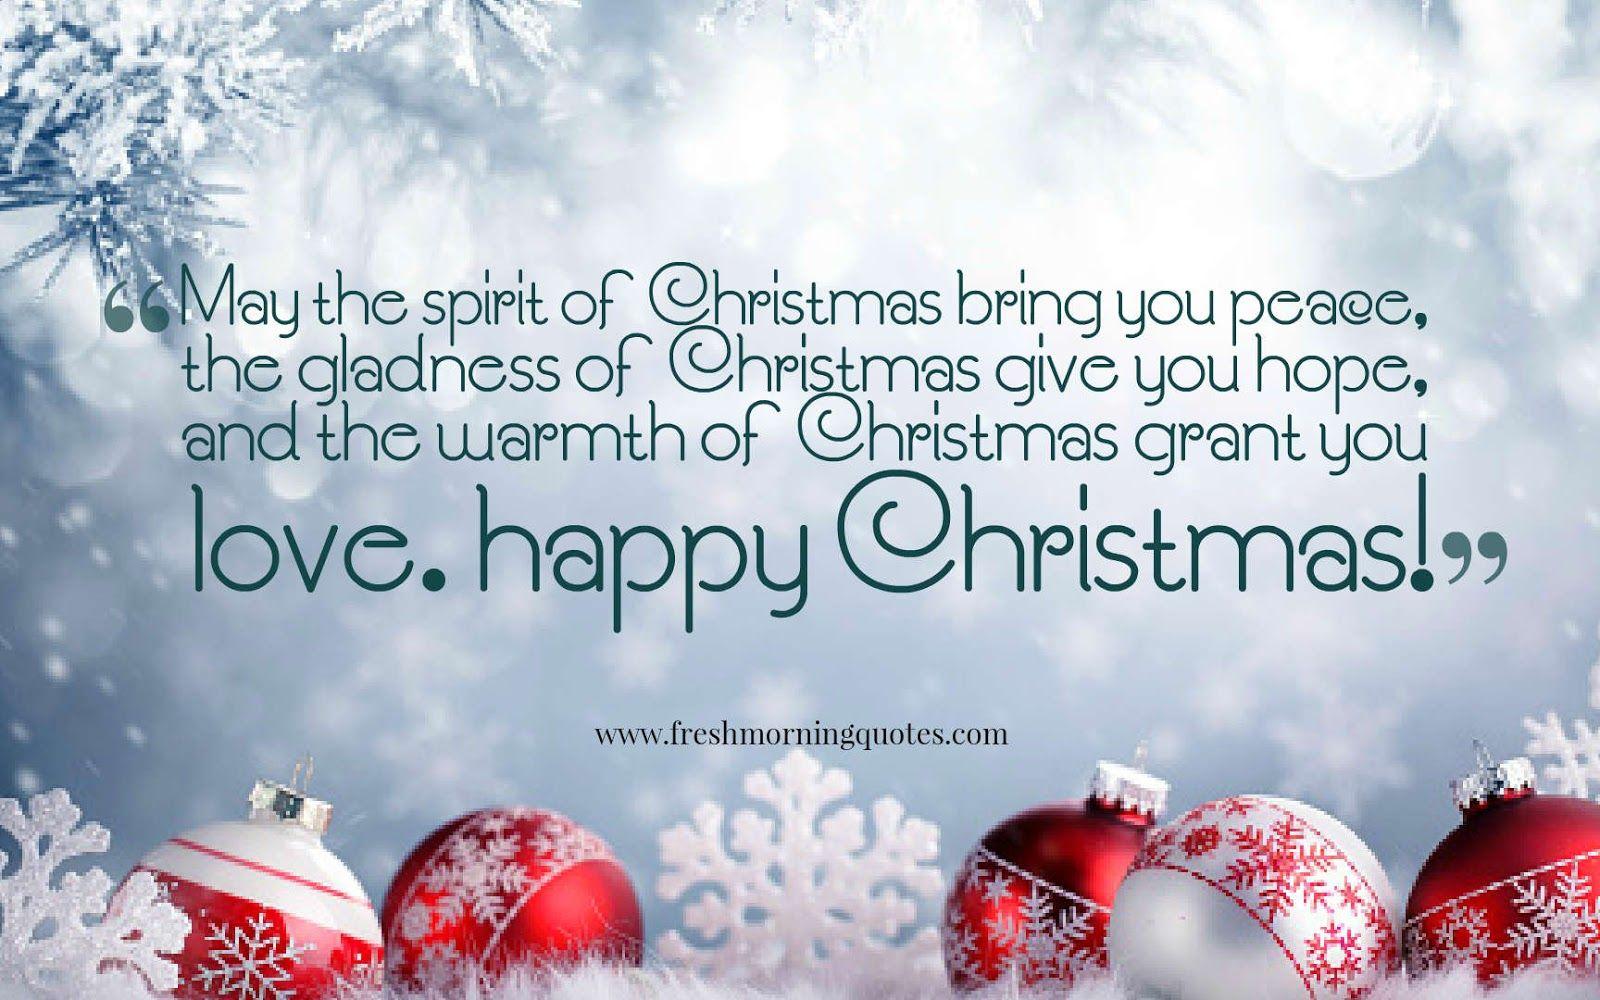 Heartwarming Merry Christmas Greetings Heartwarming Christmas Message Christmas Card Messages Christmas Wishes Quotes Christmas Love Quotes